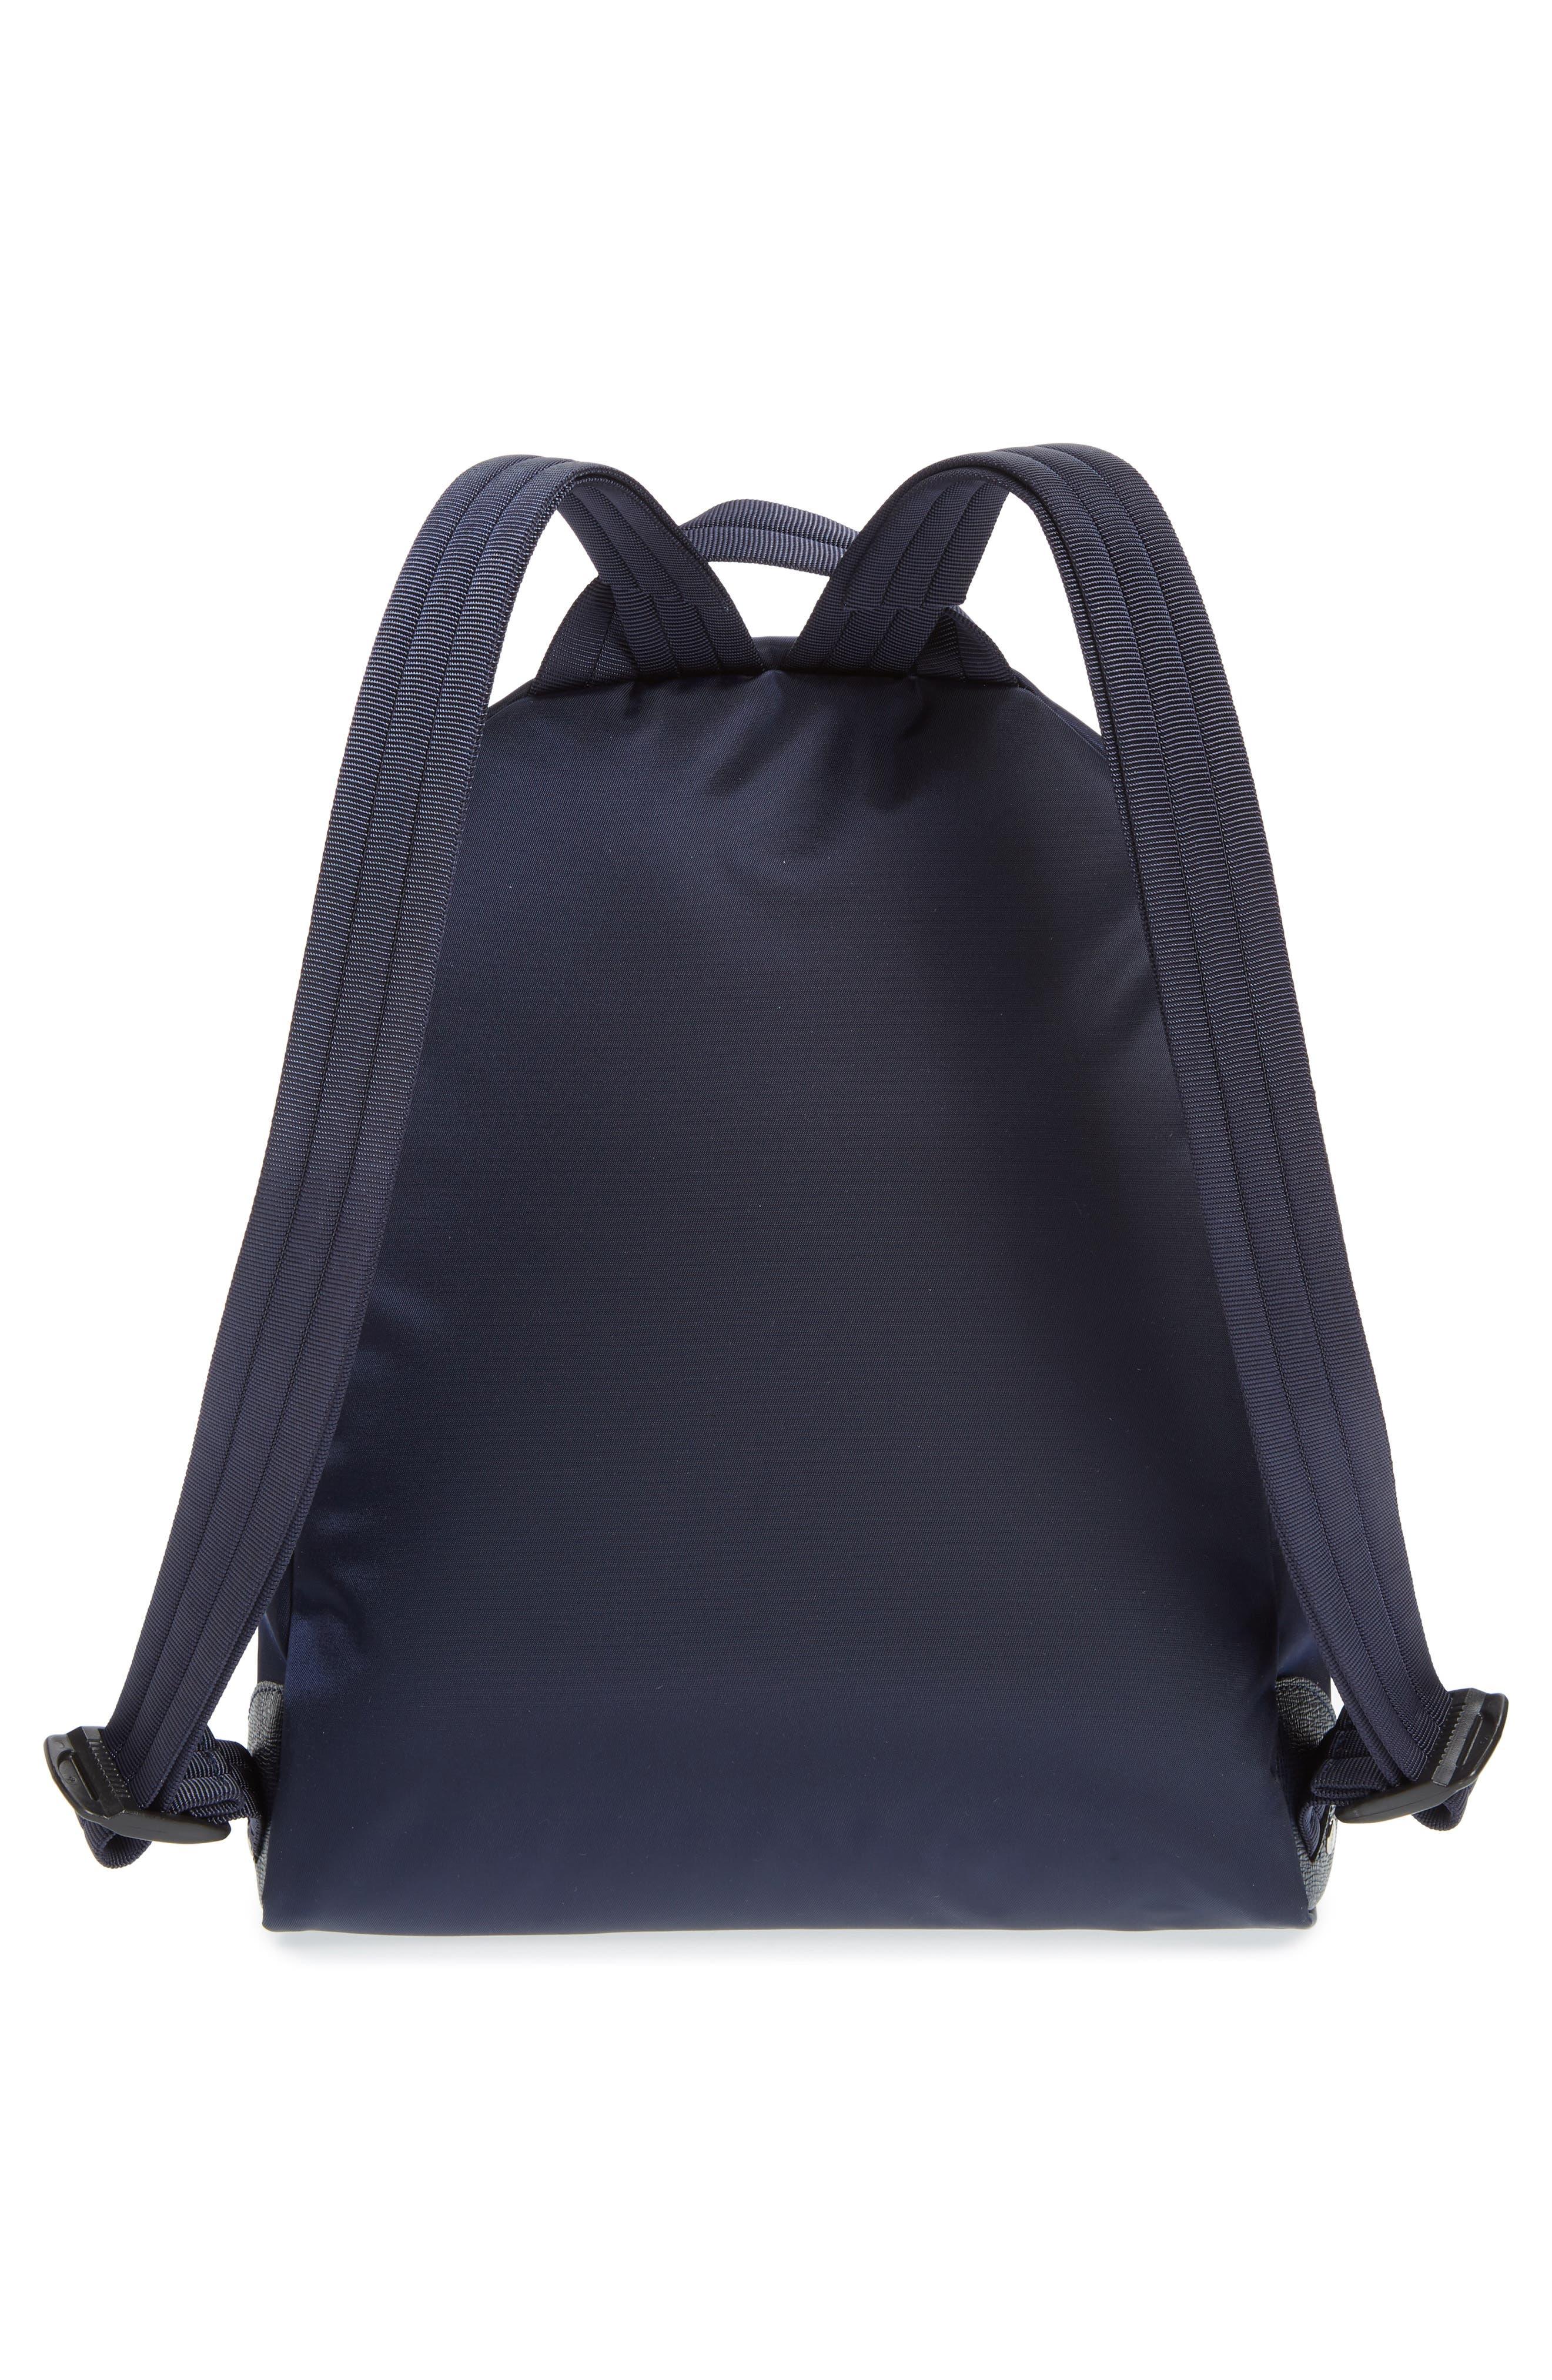 'Small Le Pliage Neo' Nylon Backpack,                             Alternate thumbnail 3, color,                             NAVY BLUE